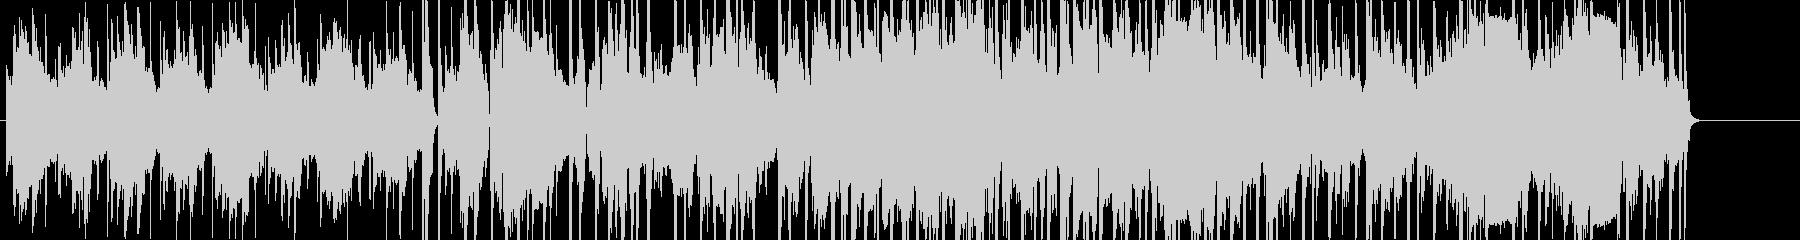 toueiの未再生の波形